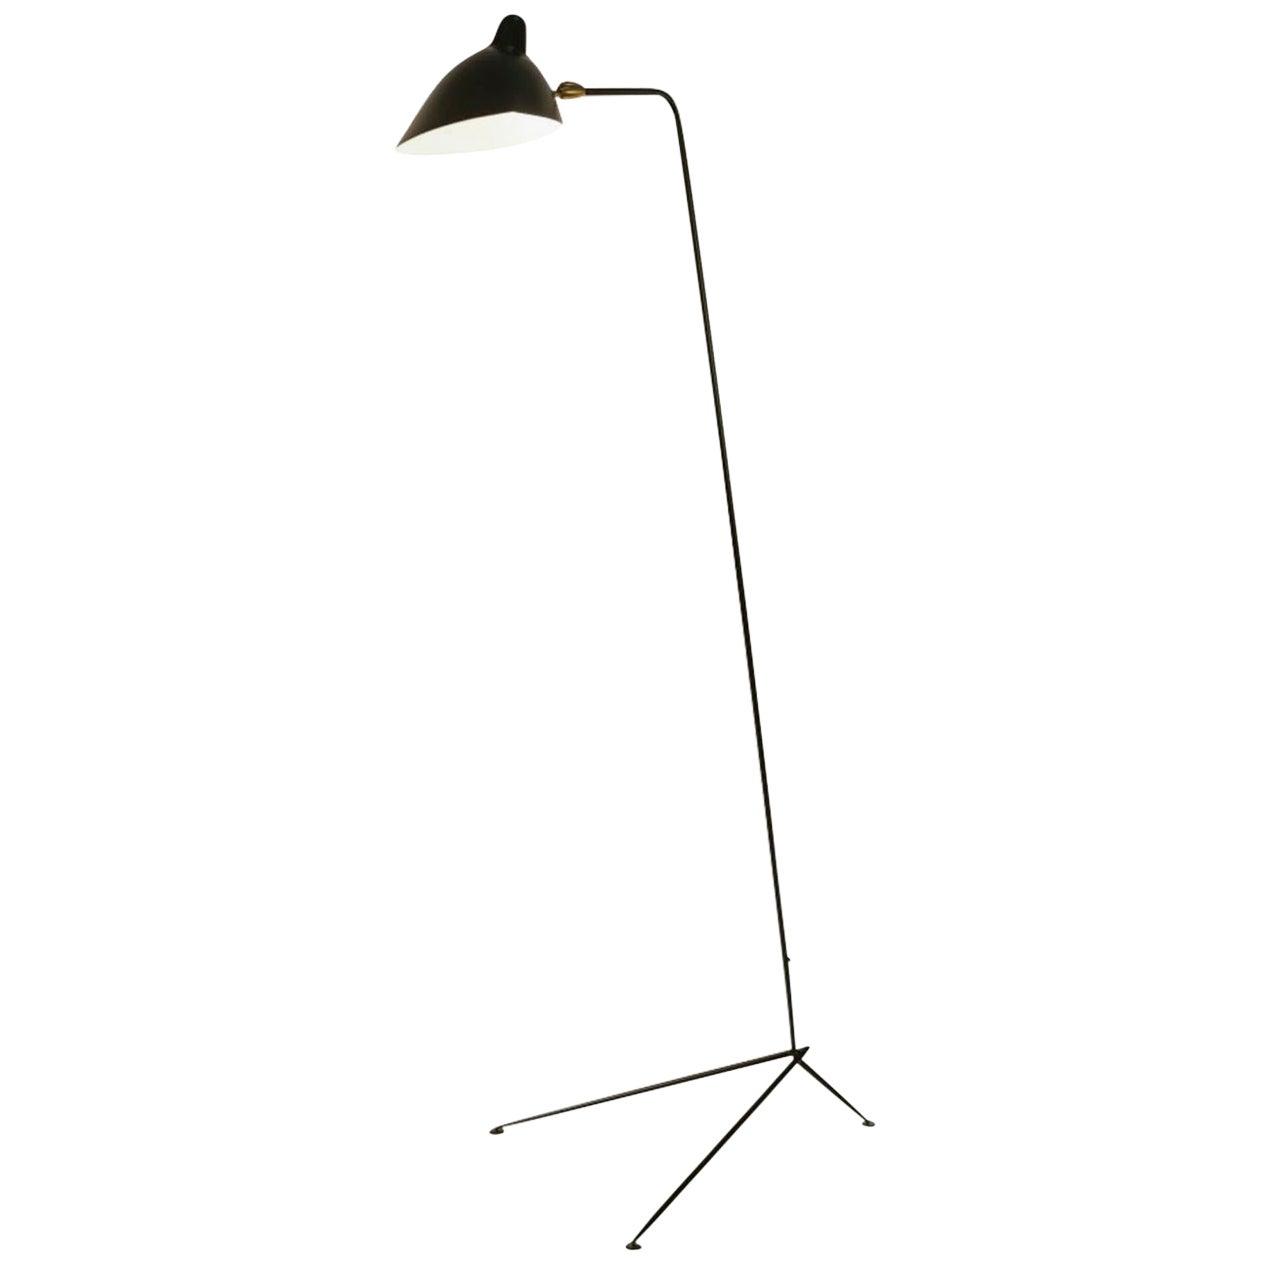 Editions Serge Mouille 'Lampadaire Droit' Floor Lamp